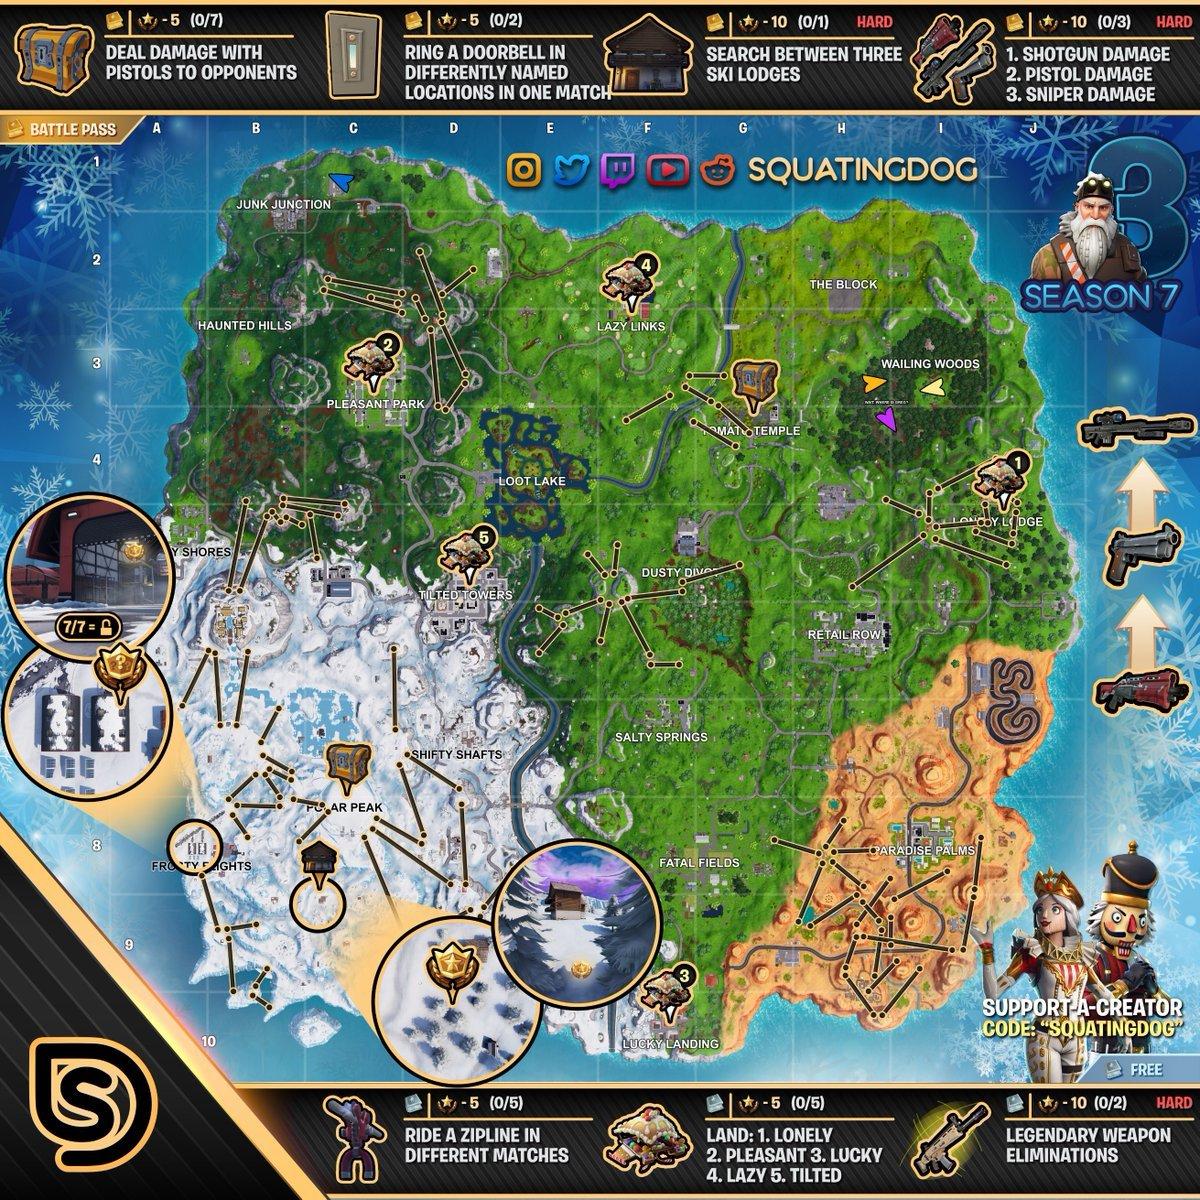 Fortnite Cheat Sheet Map For Season 7 Week 3 Challenges Fortnite